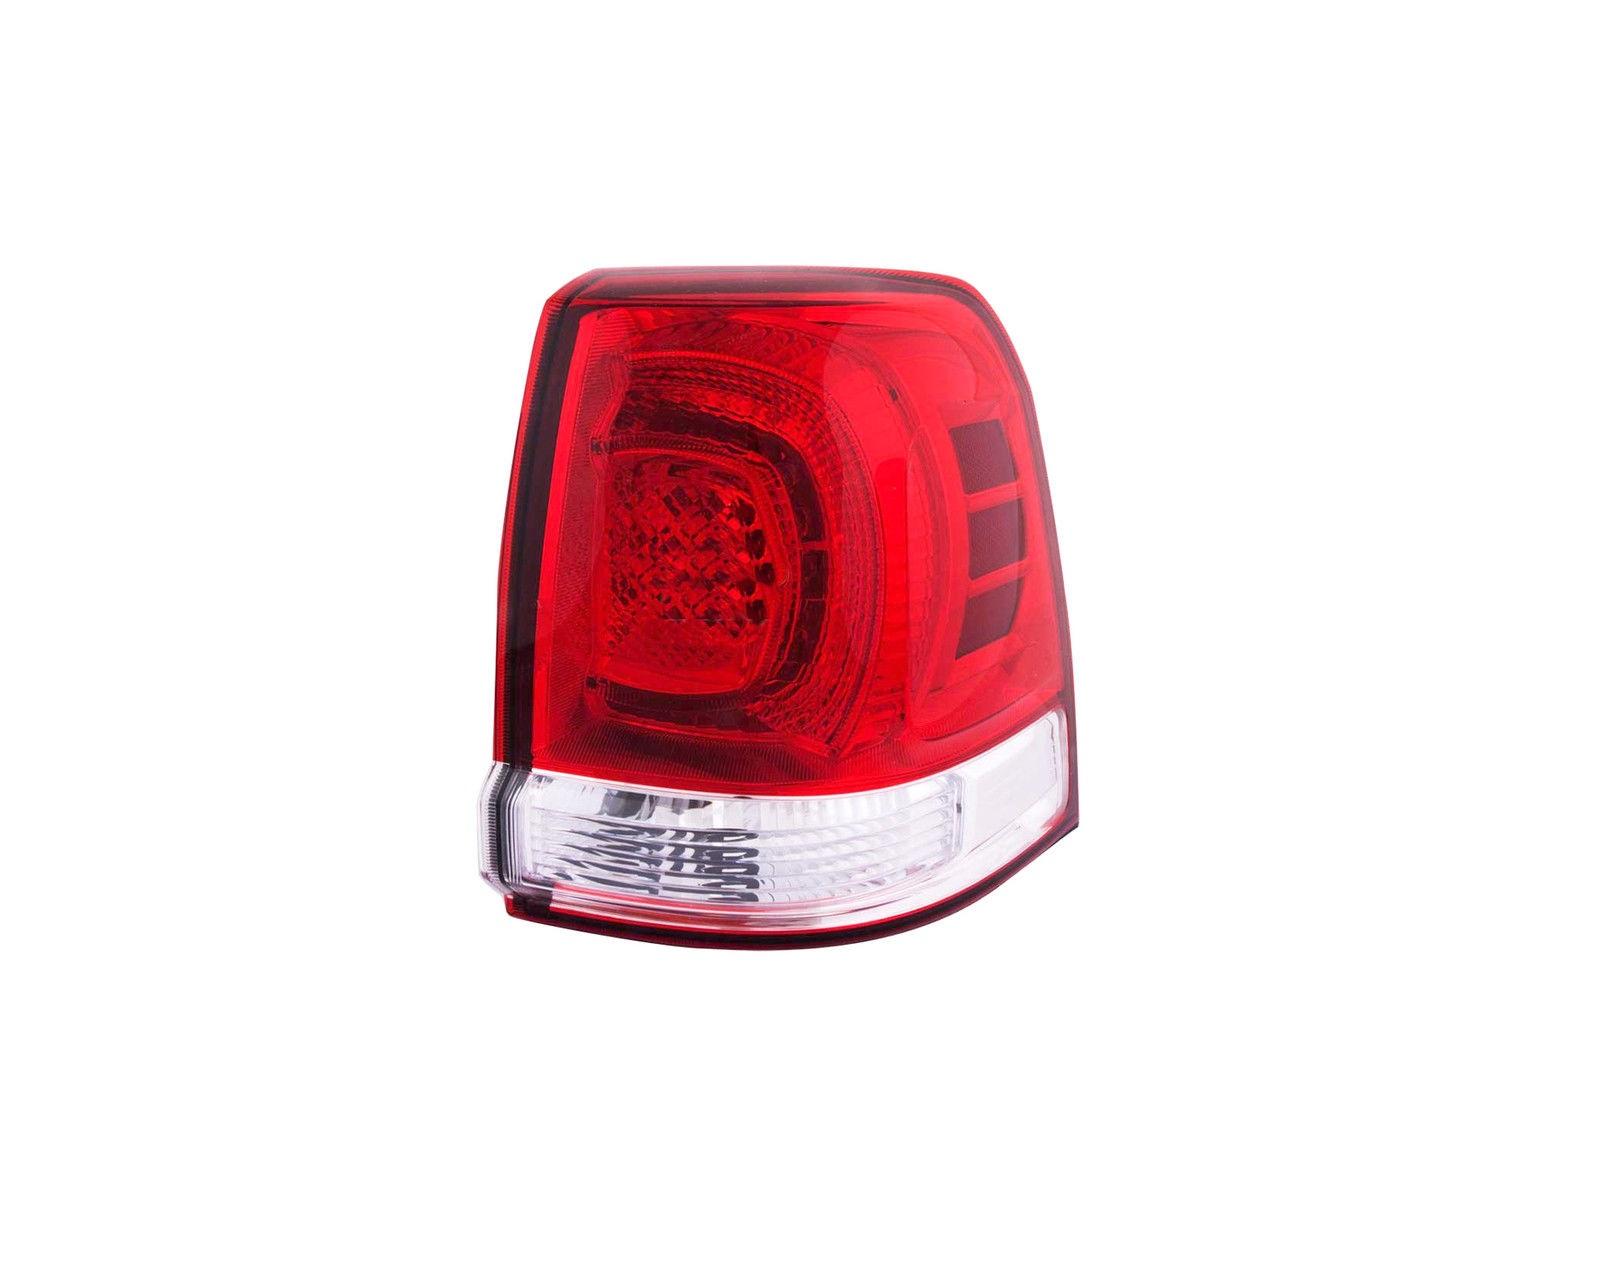 Tail light Right Side for Toyota landcruiser 200 series 2007-2014